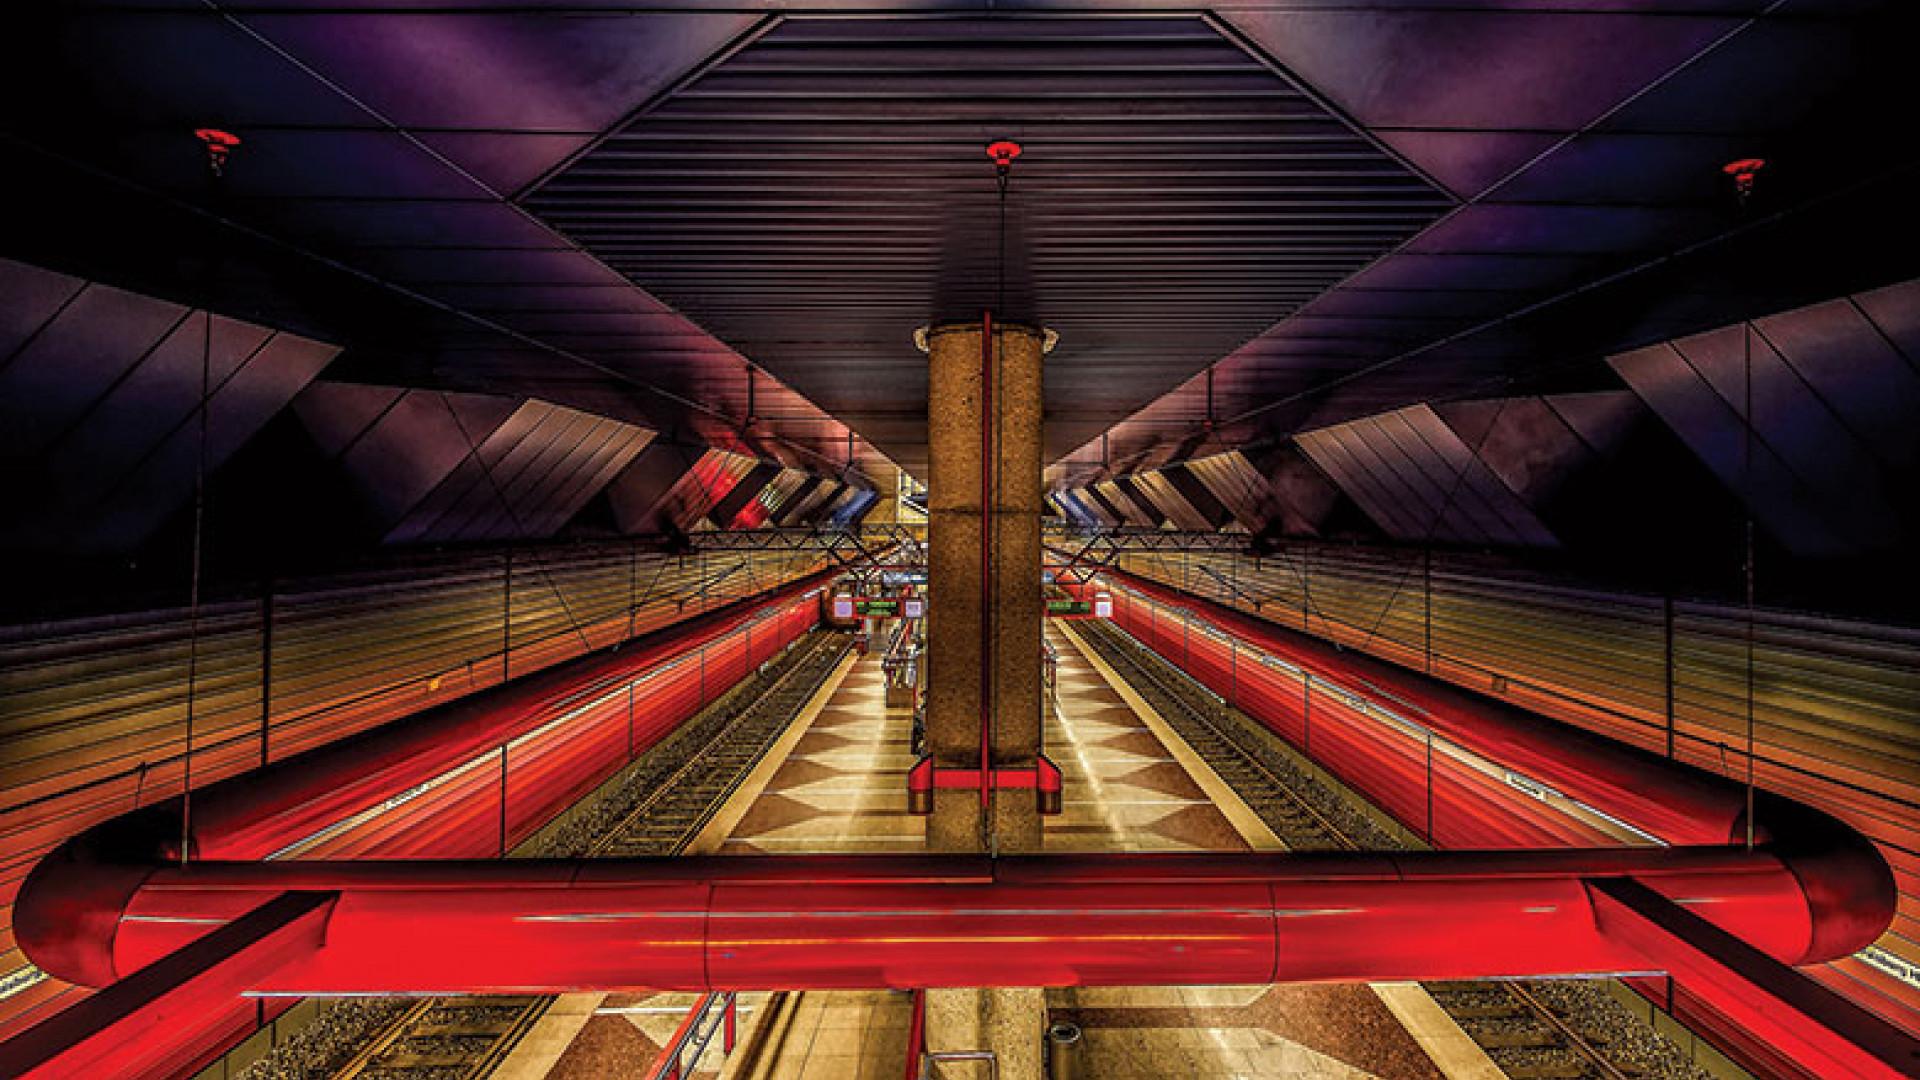 Holger_Schmidtke,_Germany,_Entry,_Open_Architecture,_2014_Sony_World_Photography_Awards.jpg_cmyk